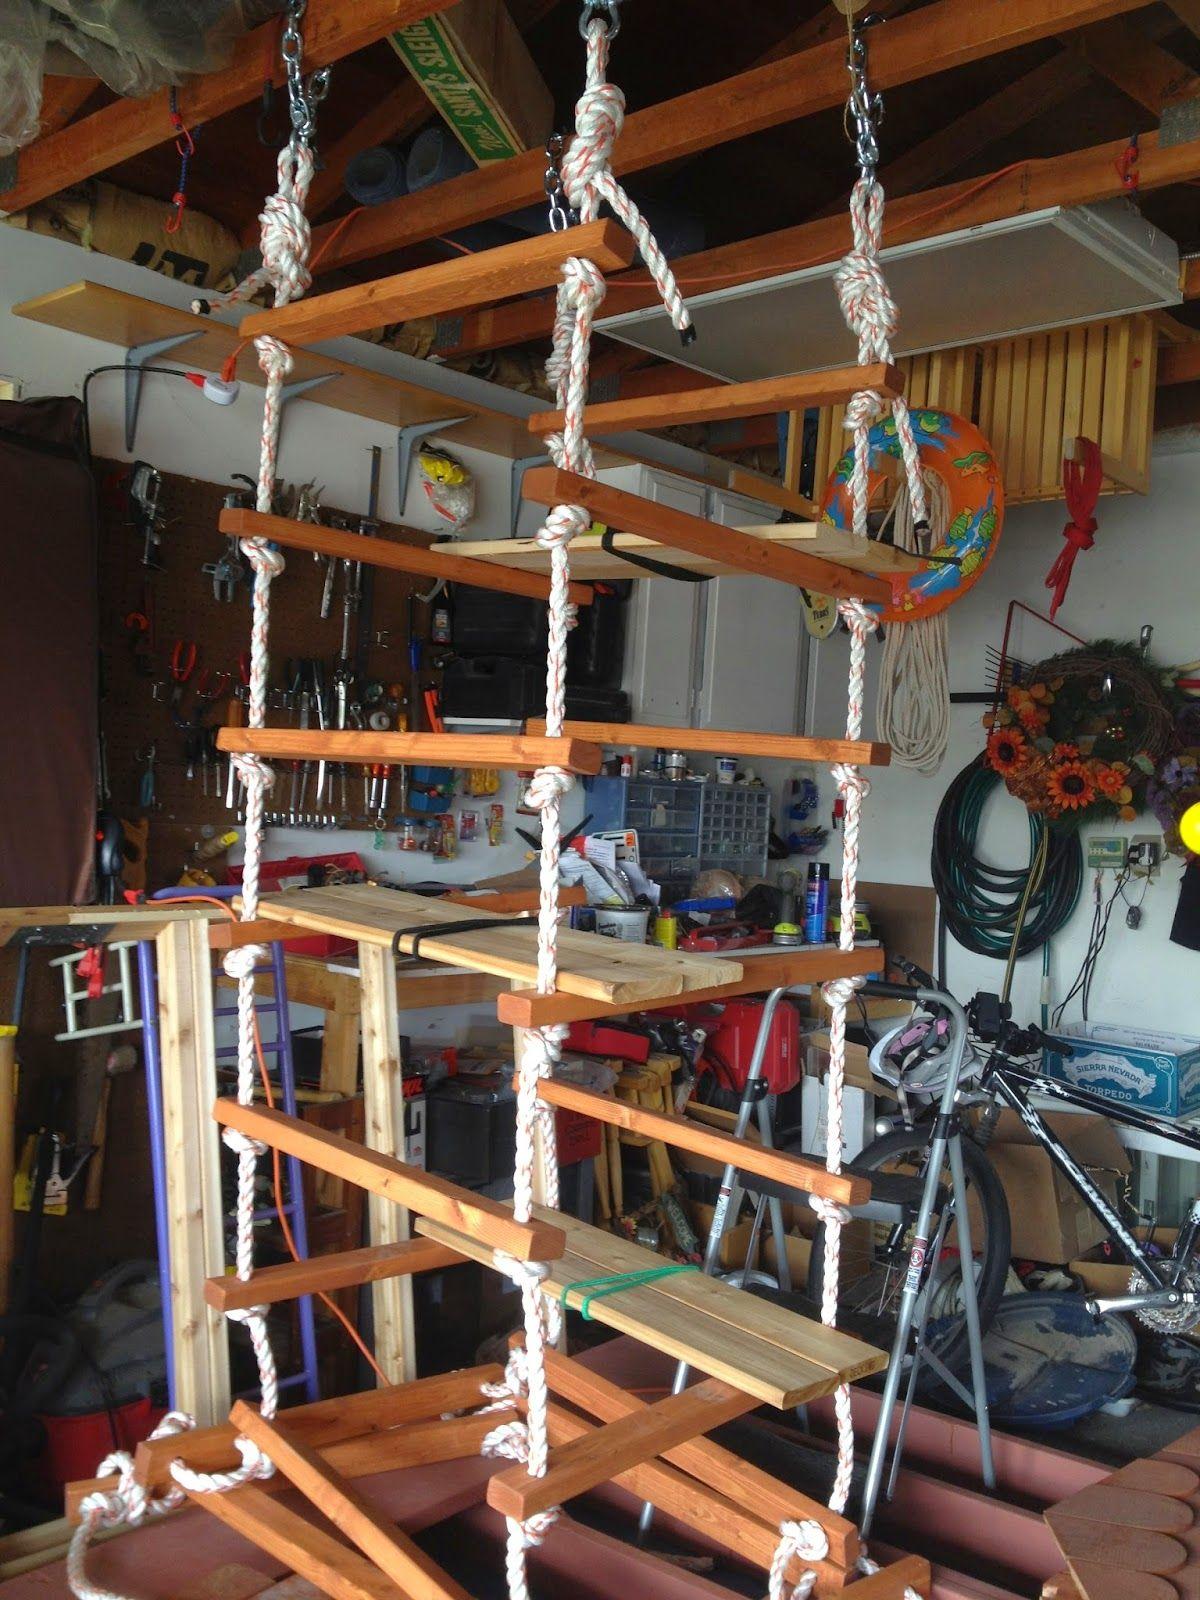 Treehouse Rope Ladder Album on Imgur